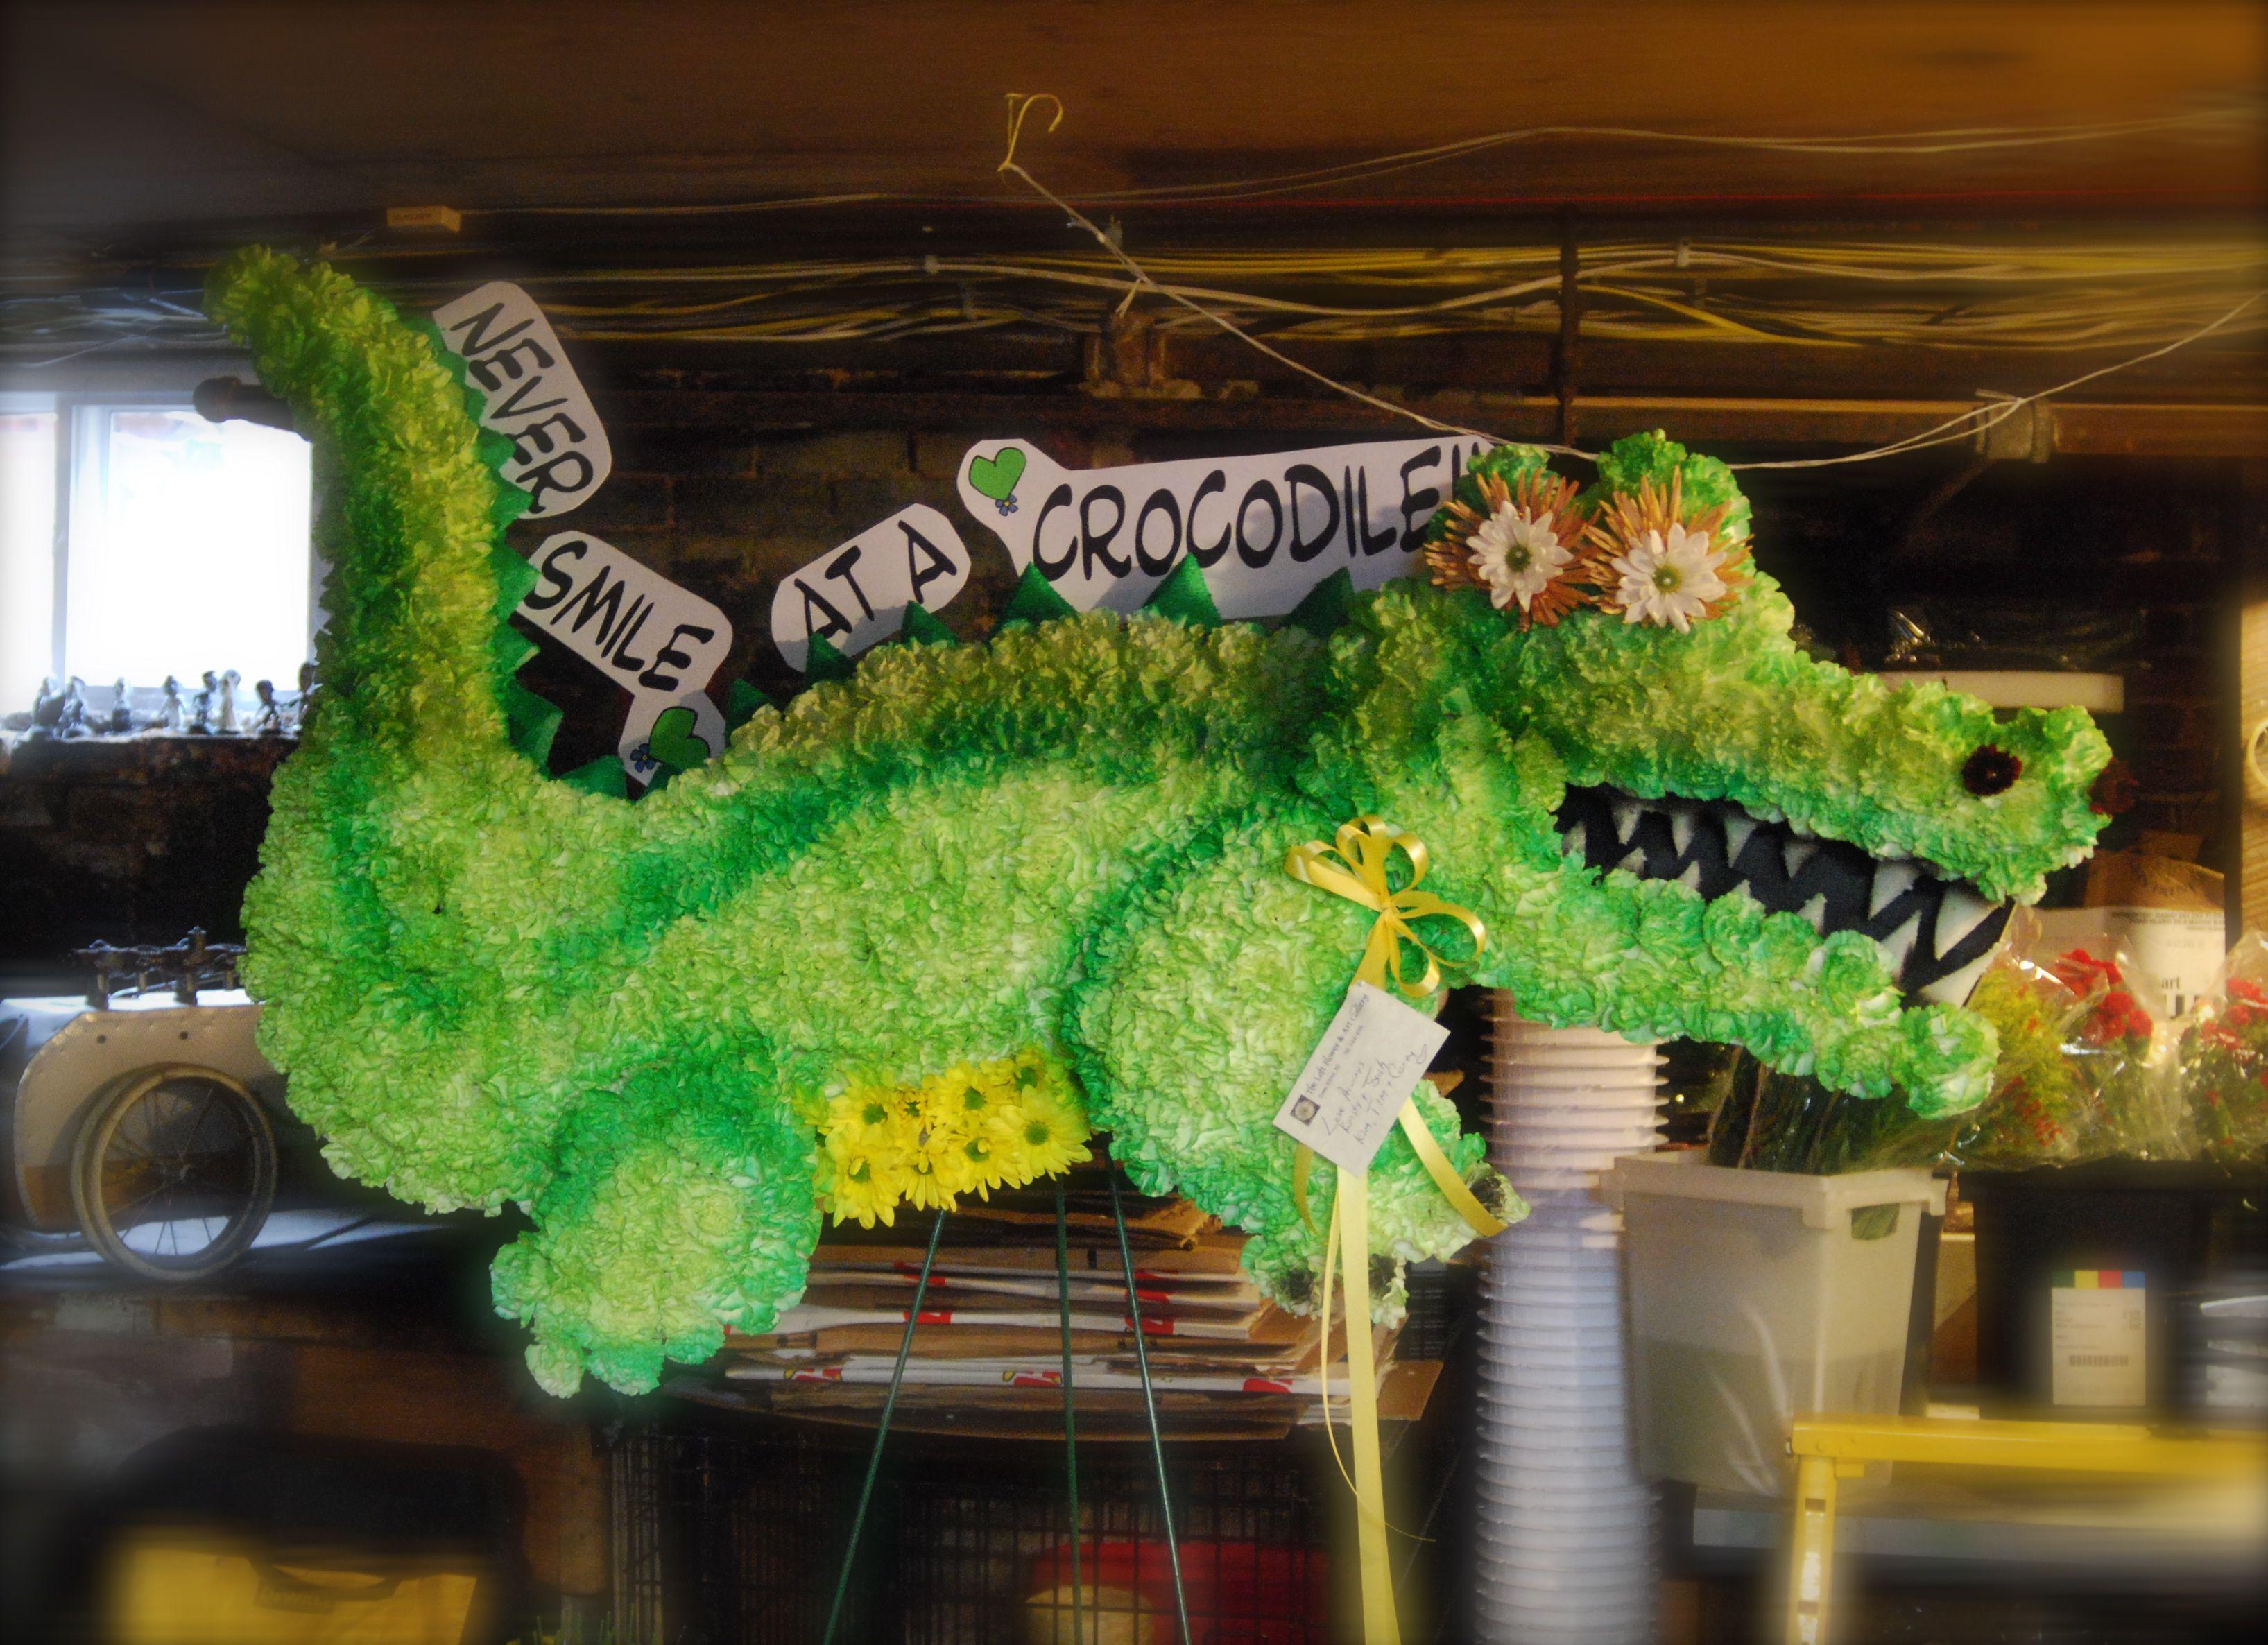 Crocodile Custom Funeral Flowers Sculpture Theloftflorist